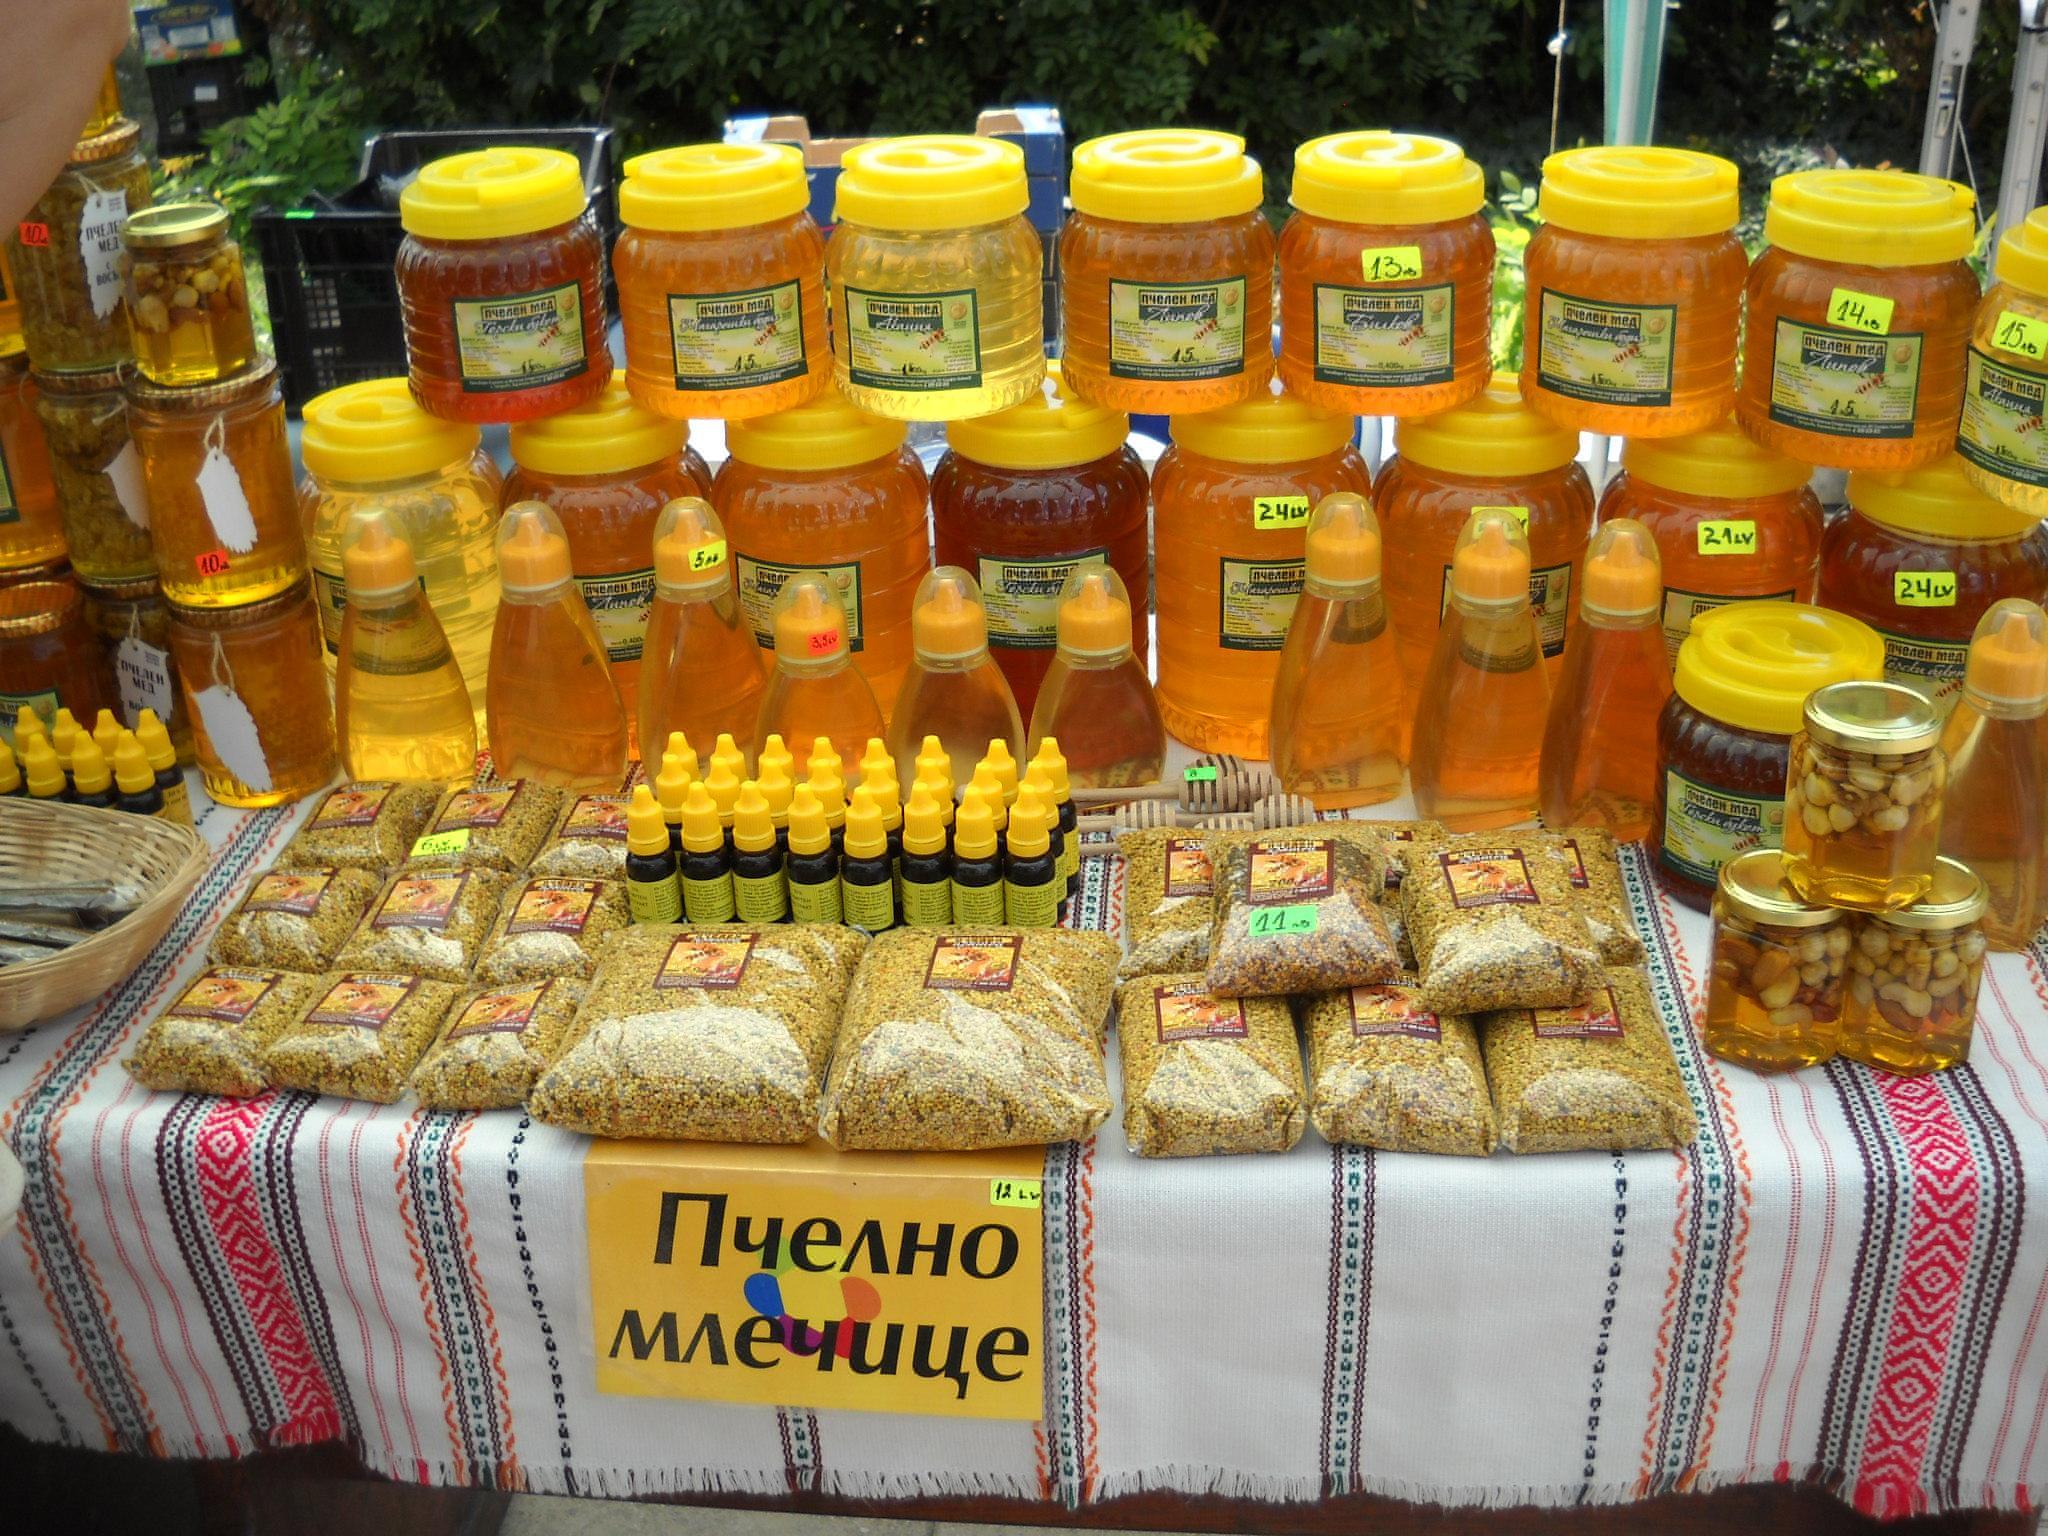 Bulgarian exports up but trade balance remains negative